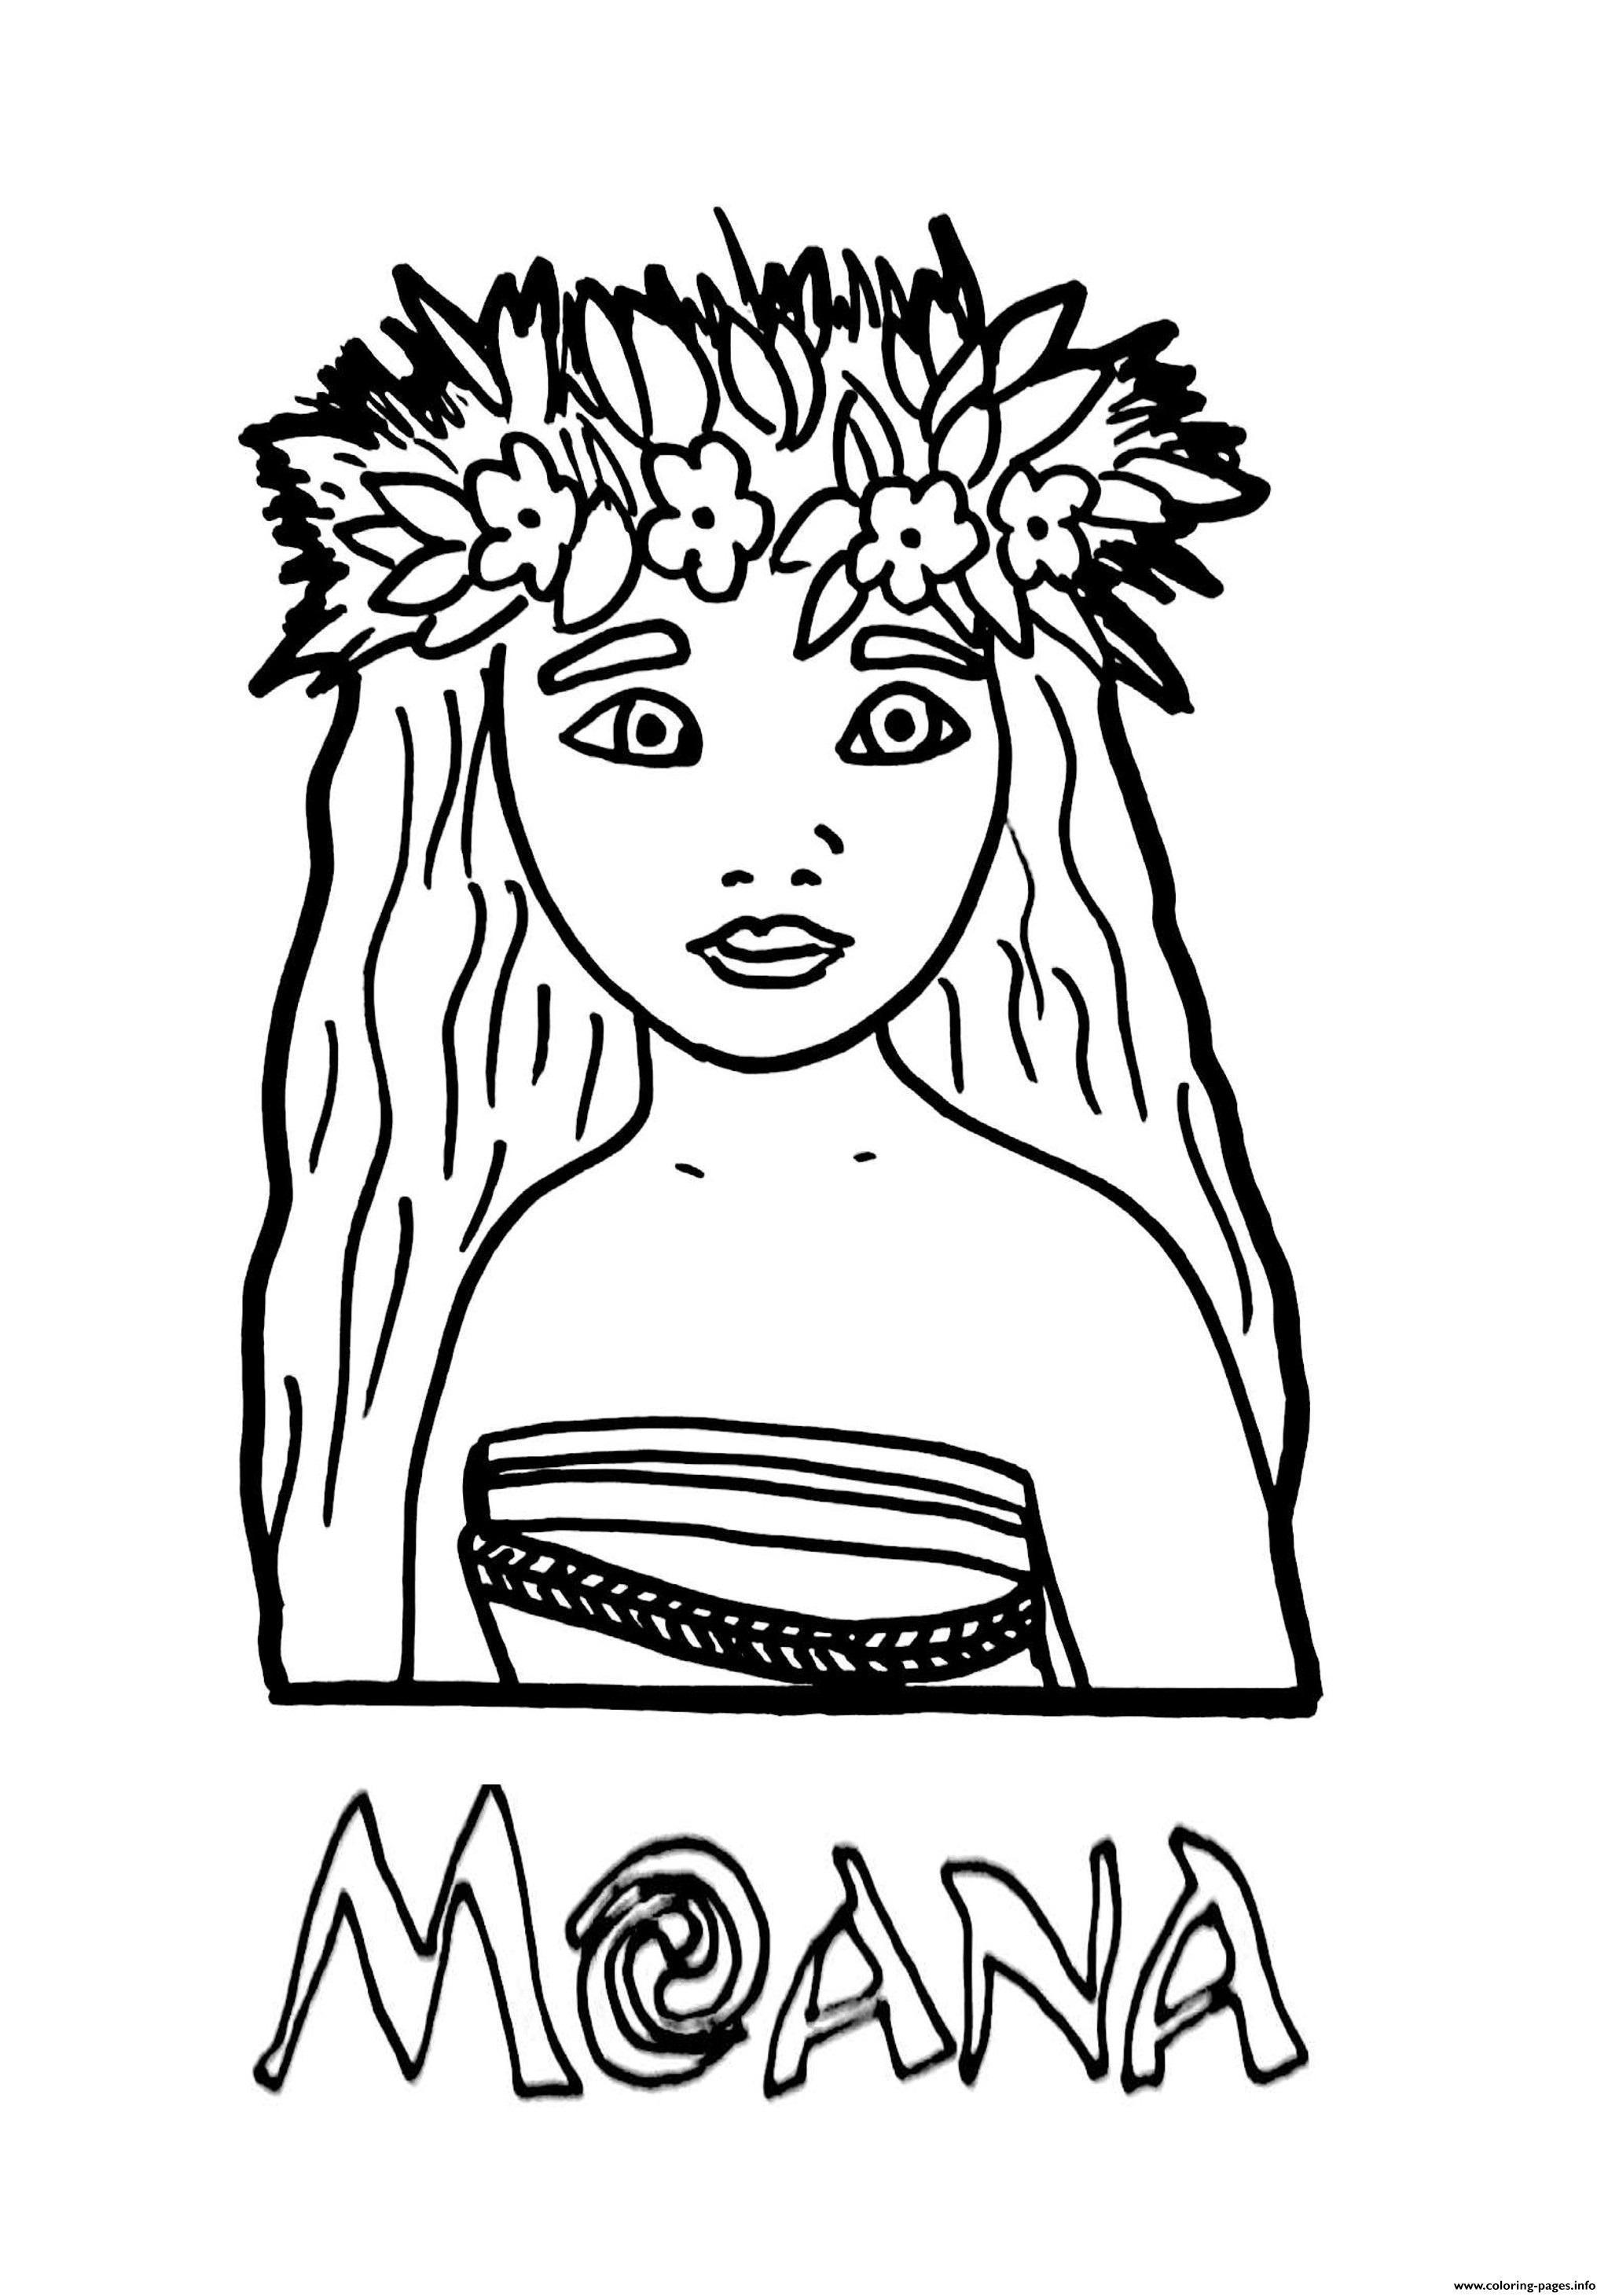 2046x2922 Printable Coloring Pagesfo Moana Princess Printable Coloring Pages